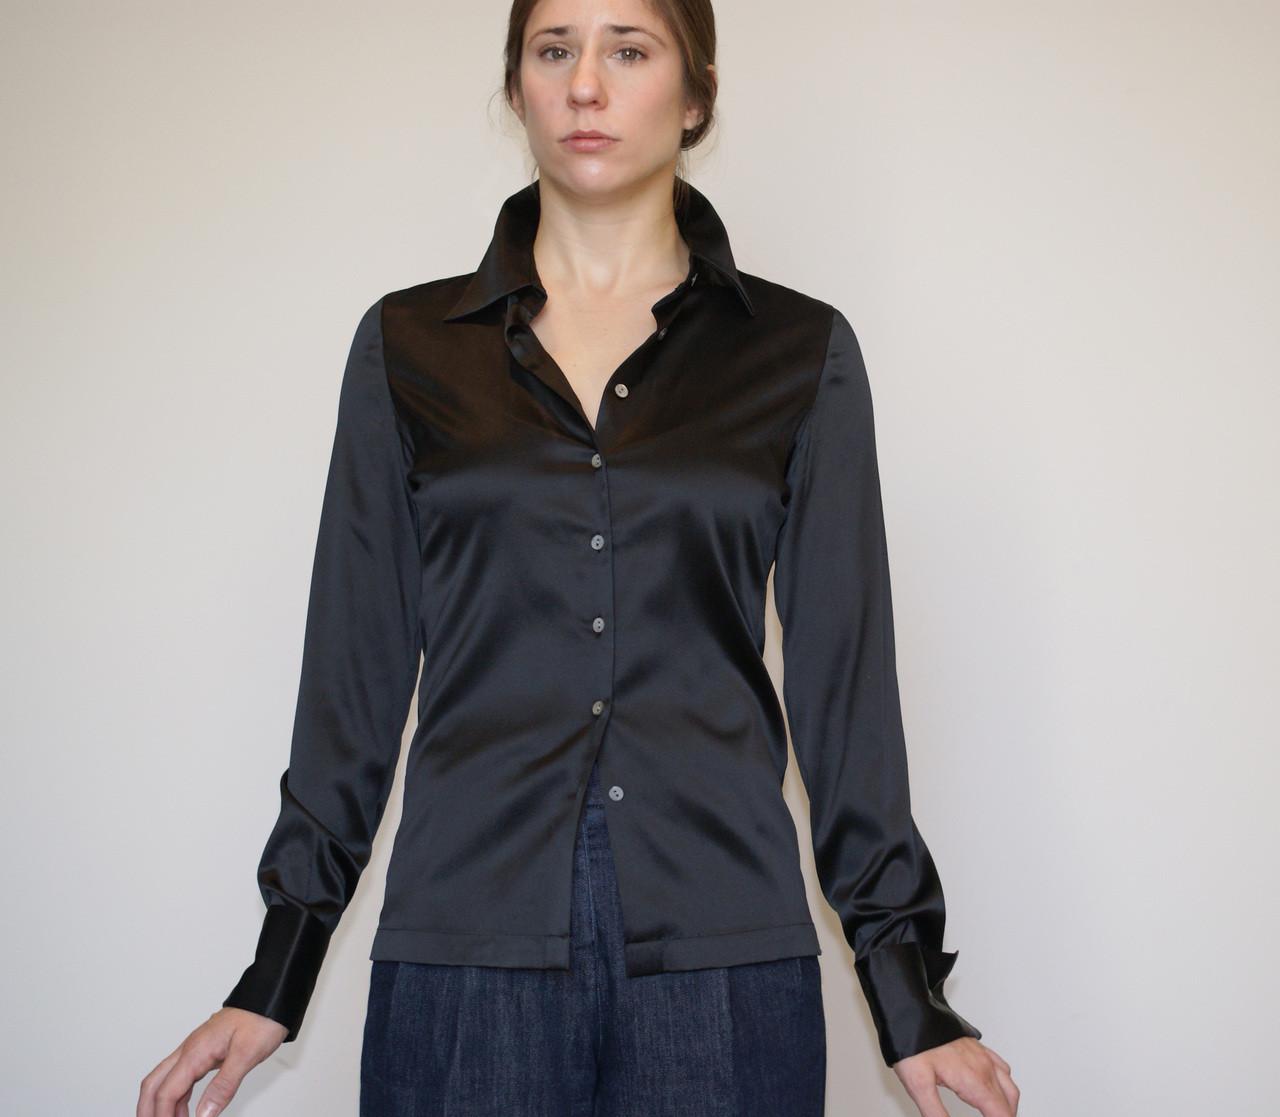 Women S Black Silk Charmeuse Button Up French Cuff Tuxedo Shirt Blouse